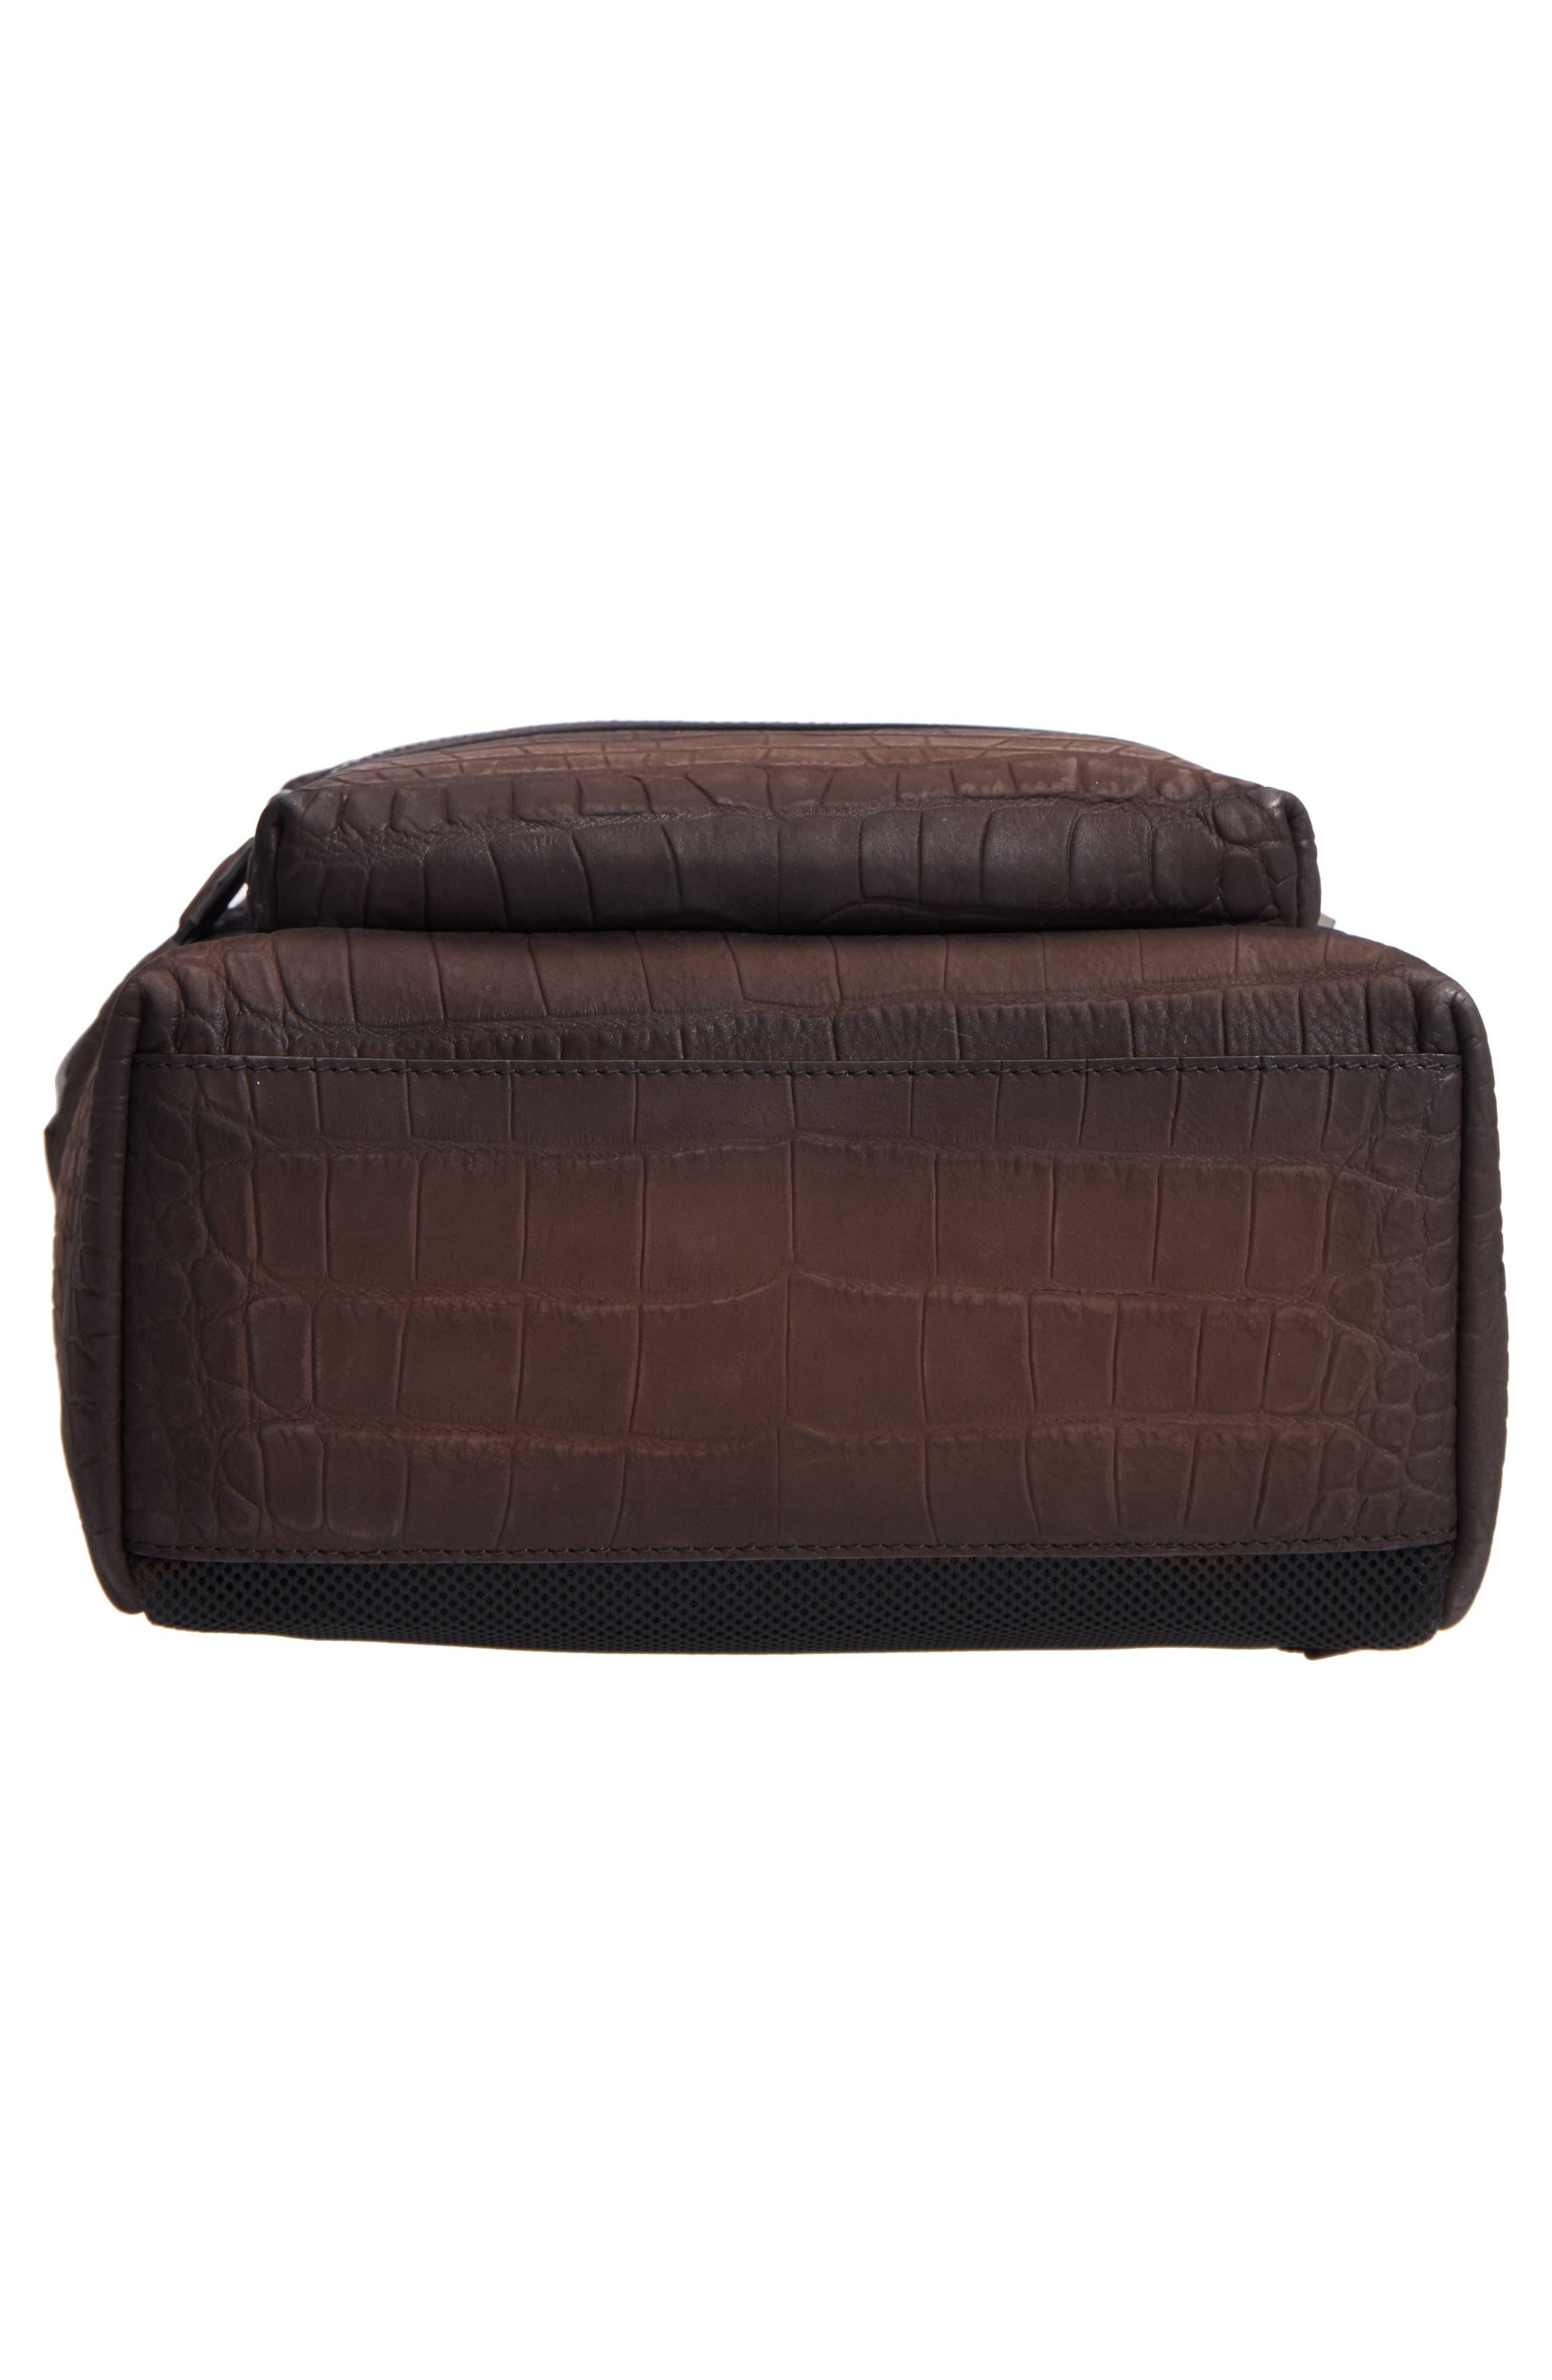 Firenze Leather Backpack,                             Alternate thumbnail 6, color,                             Moro